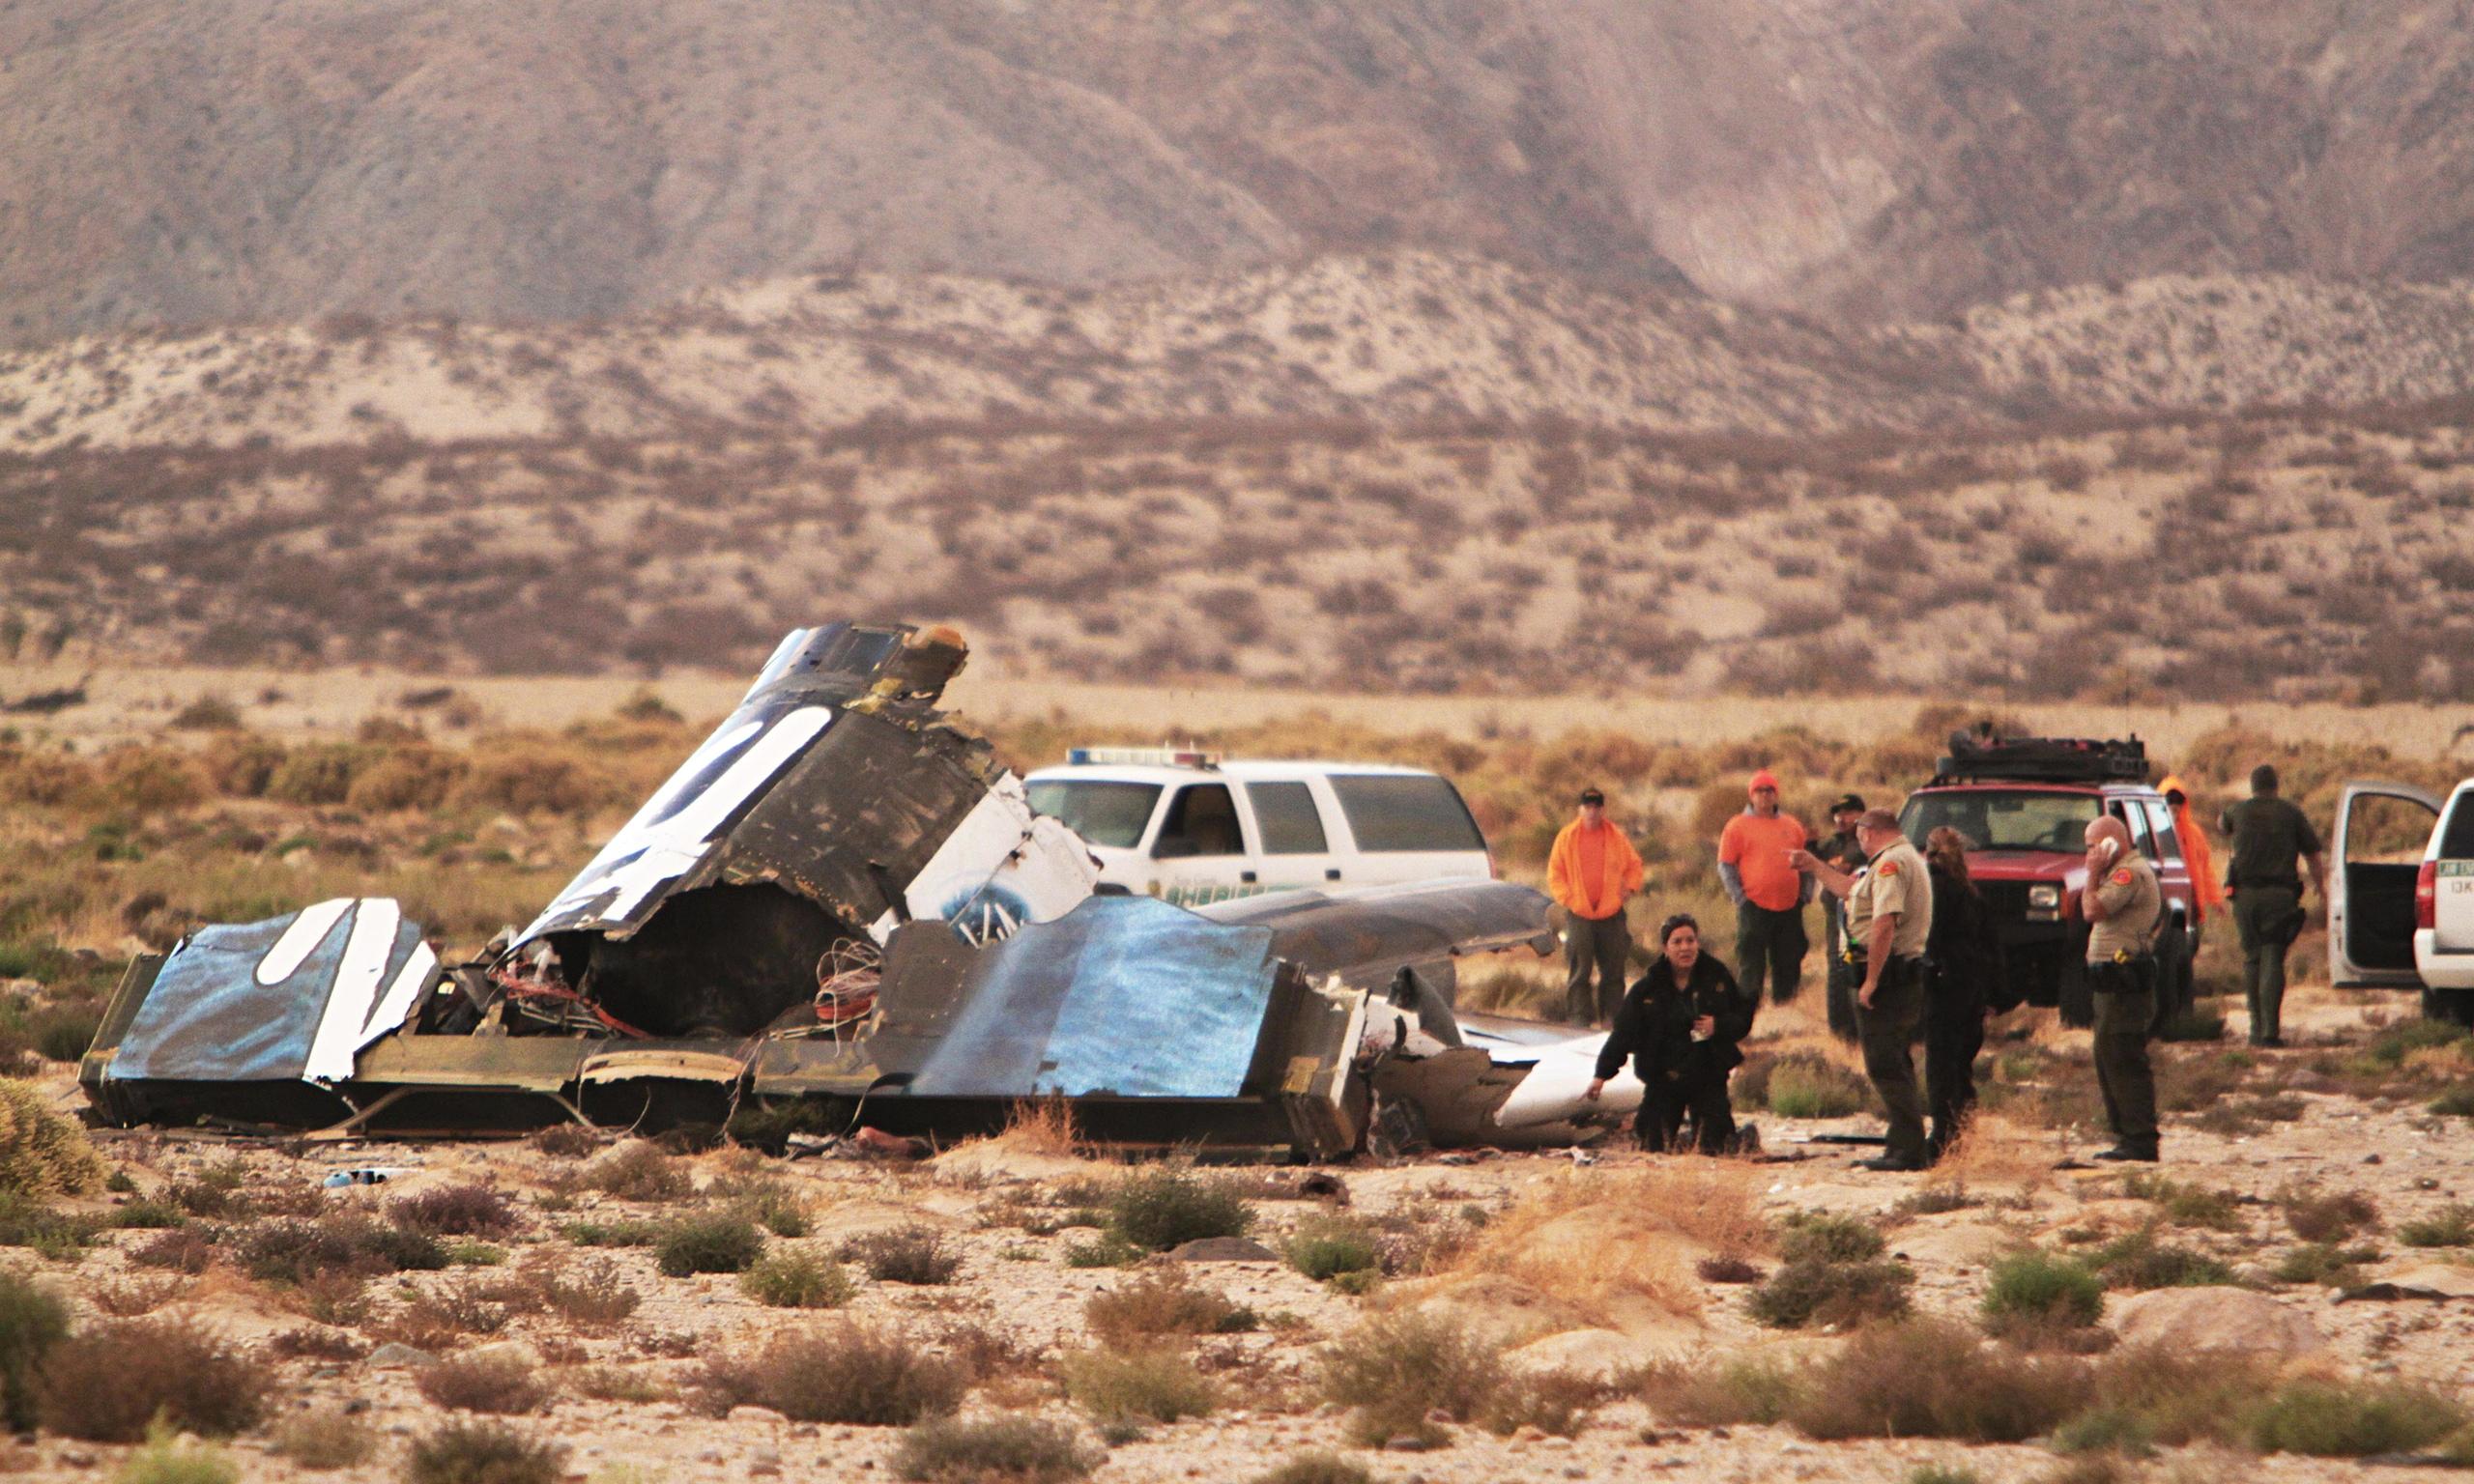 space ship crash - photo #30